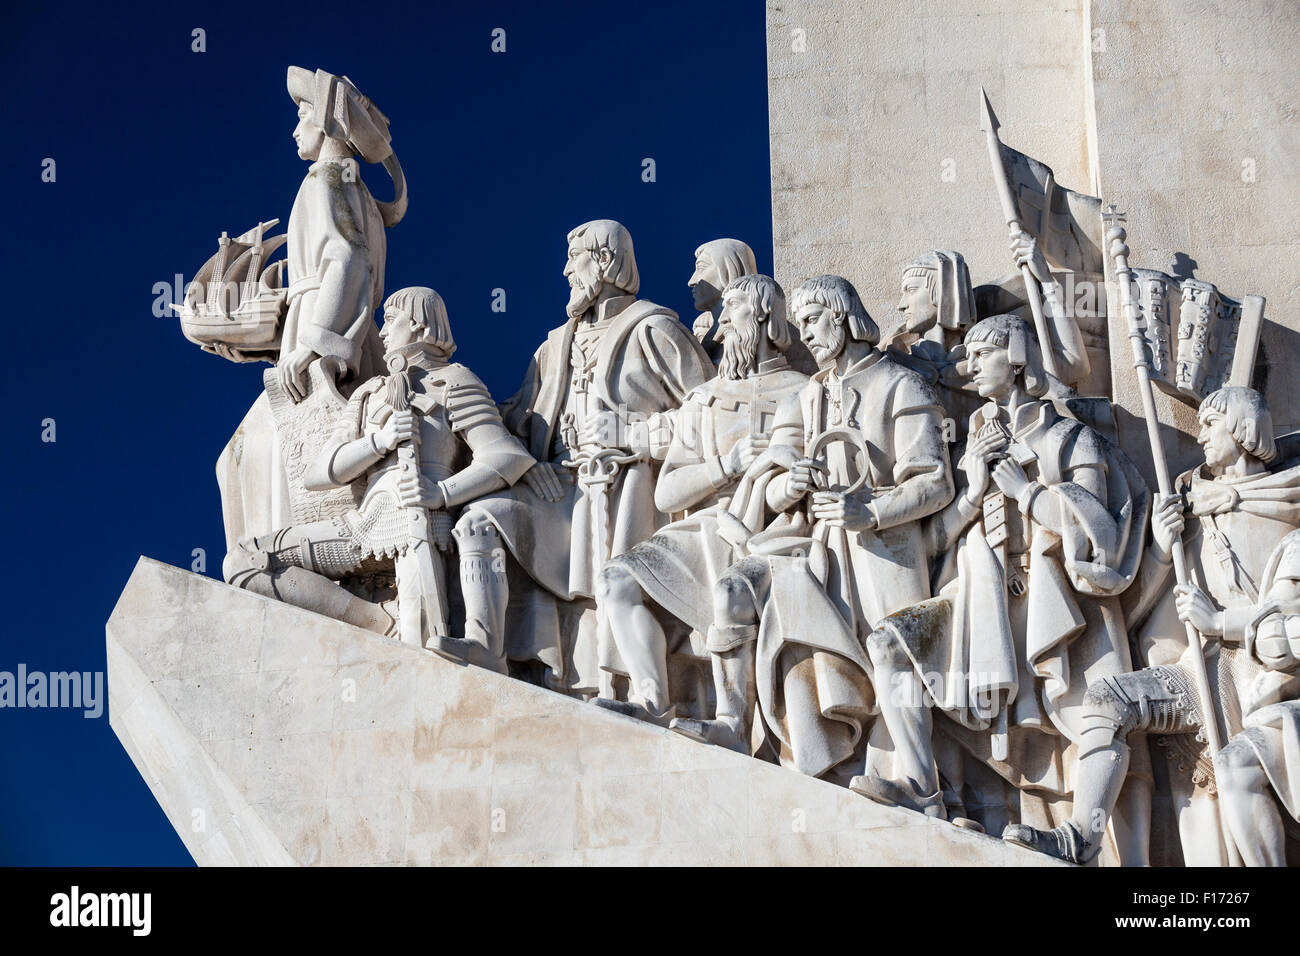 Detail des Denkmals der Entdeckungen entlang des Tejo im Abschnitt Belem in Lissabon, Portugal. Stockbild